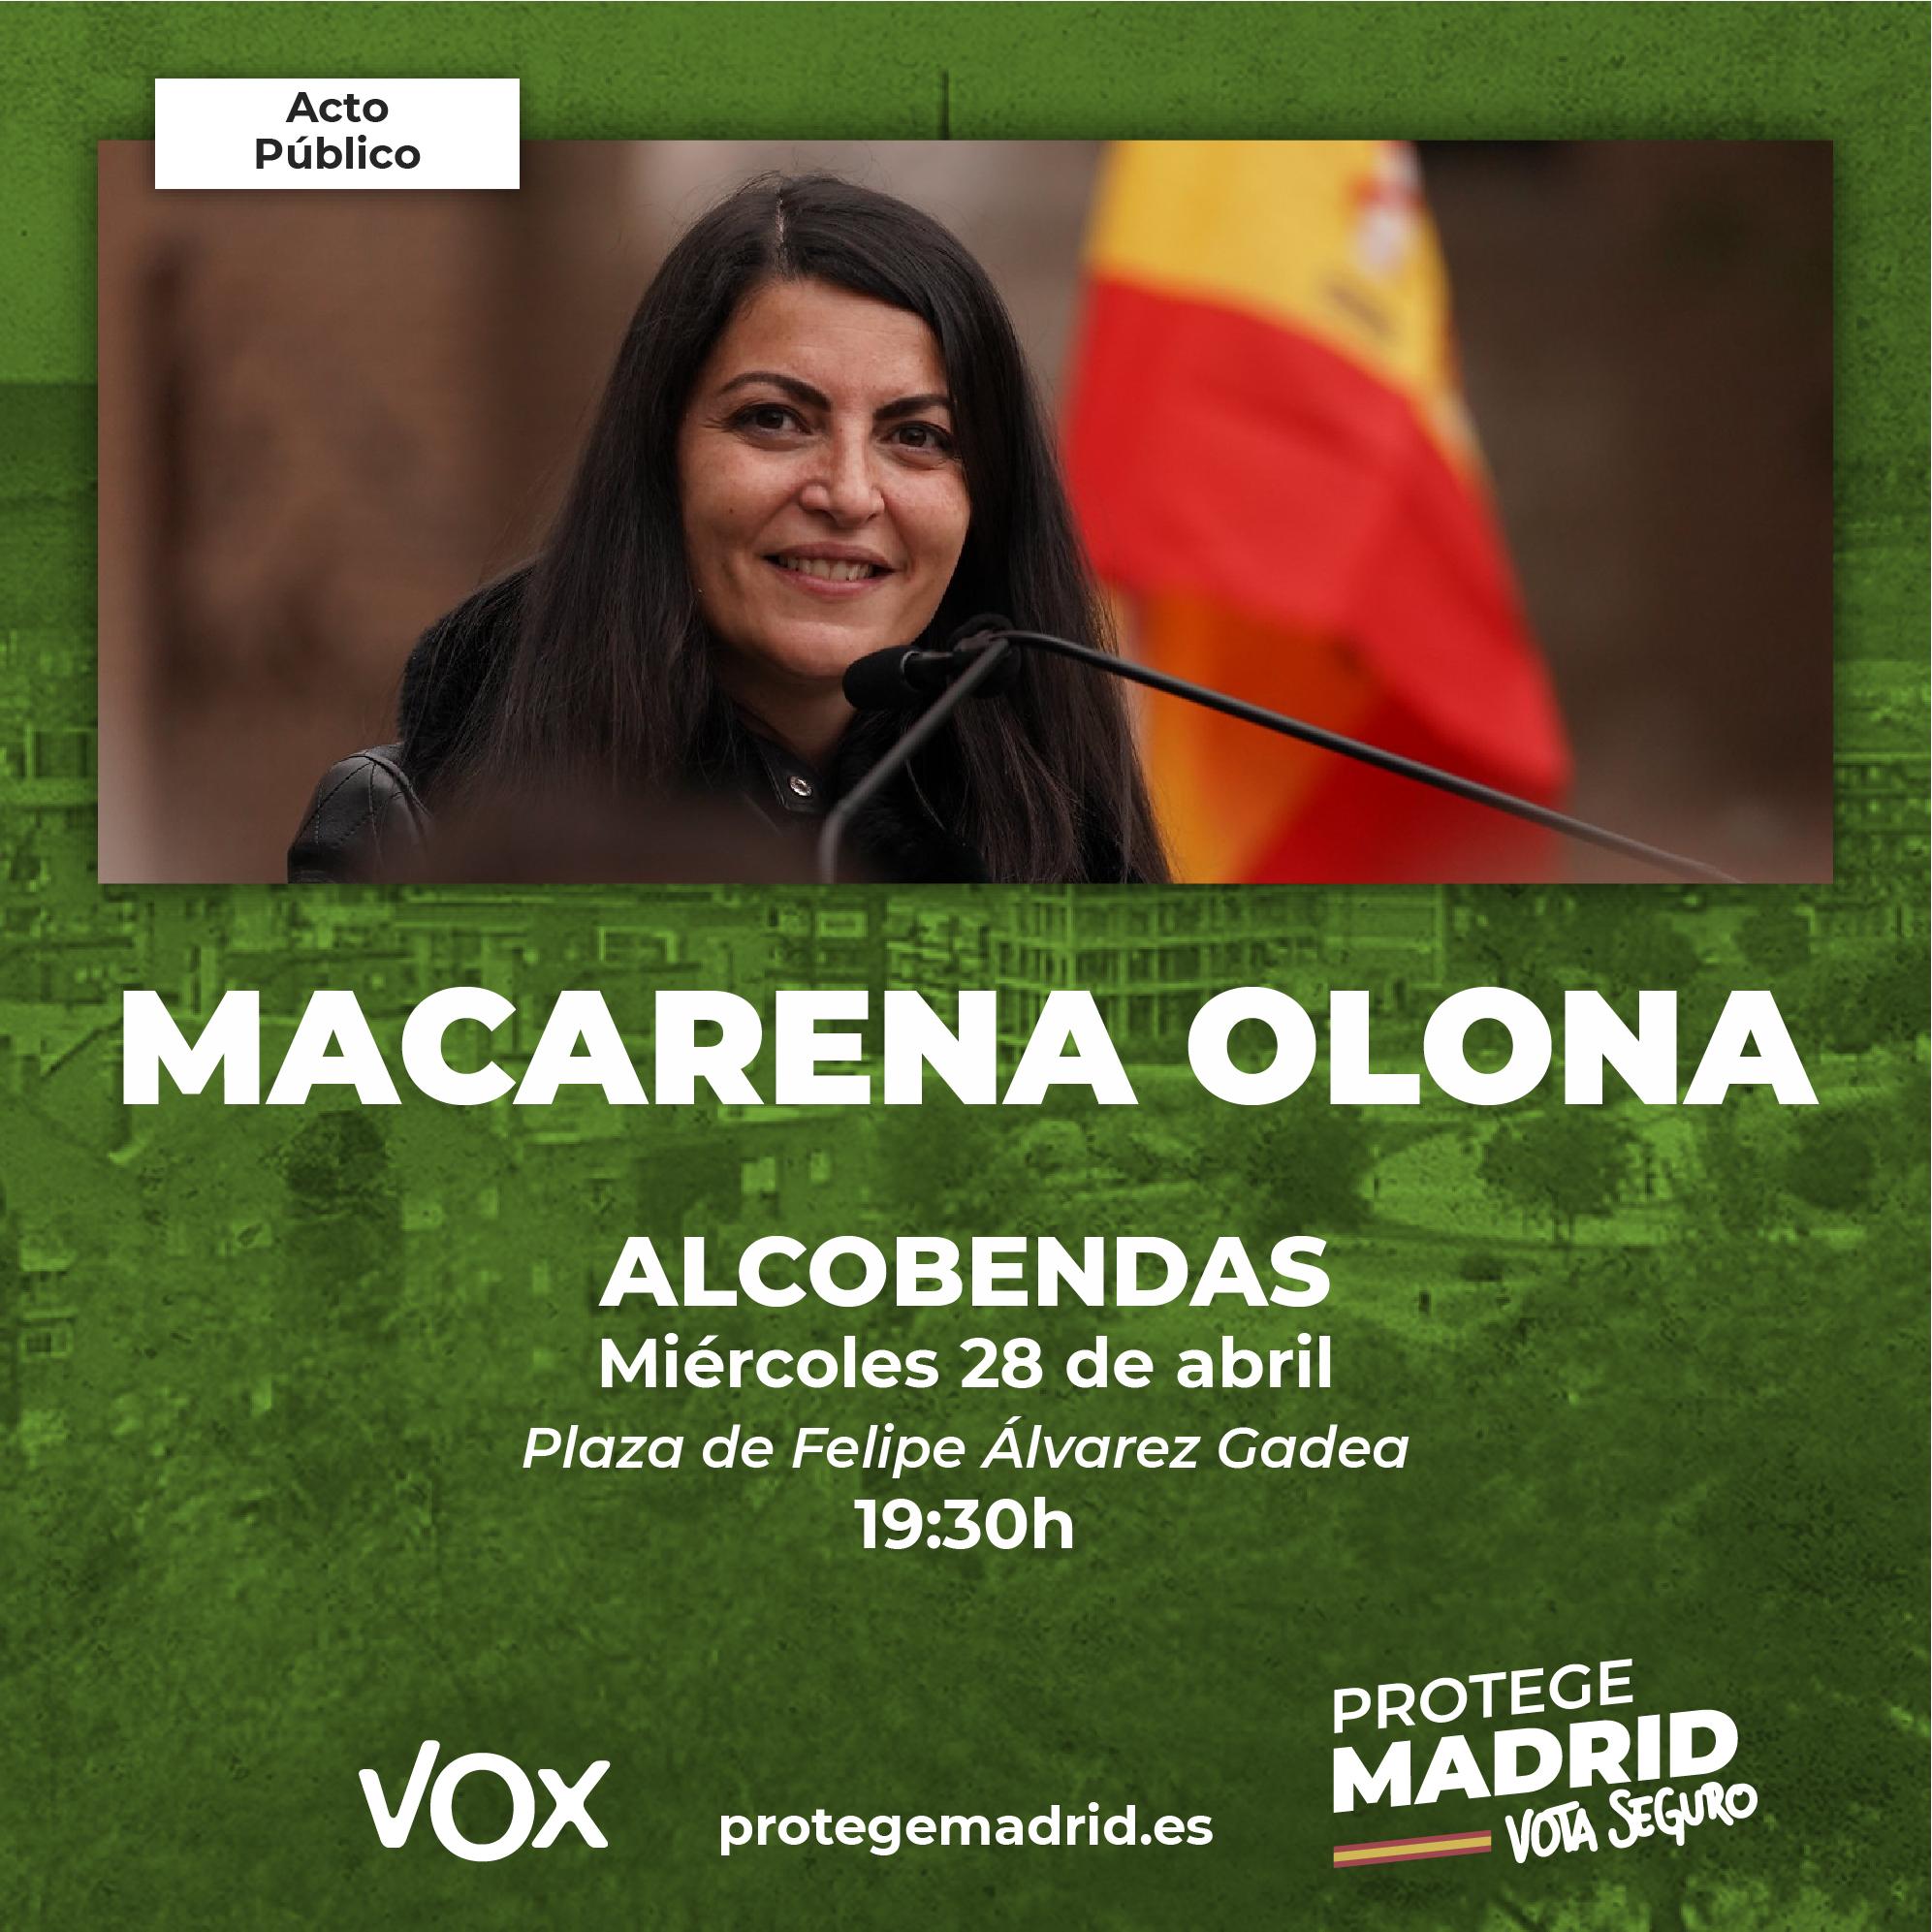 MACARENA_OLONA_ALCOBENDAS